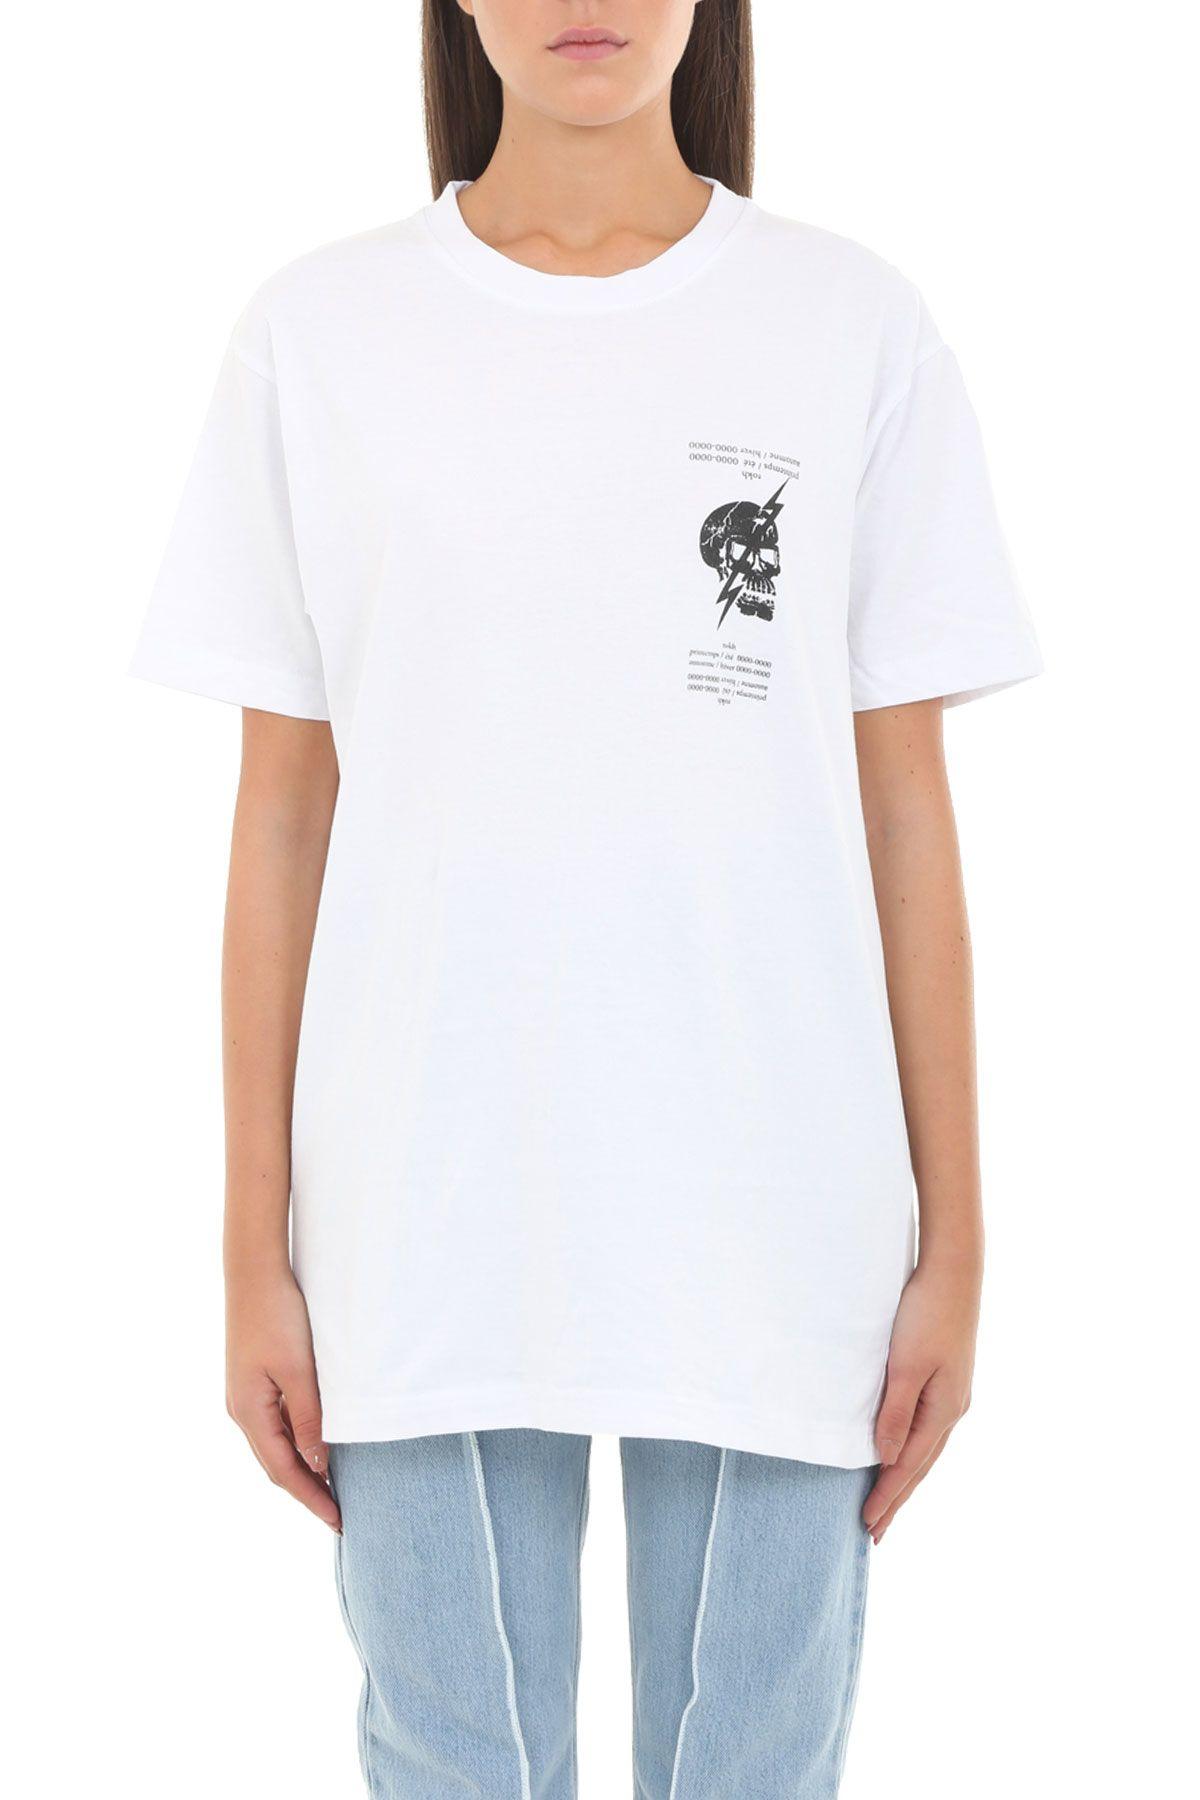 R9ca04 T-shirt